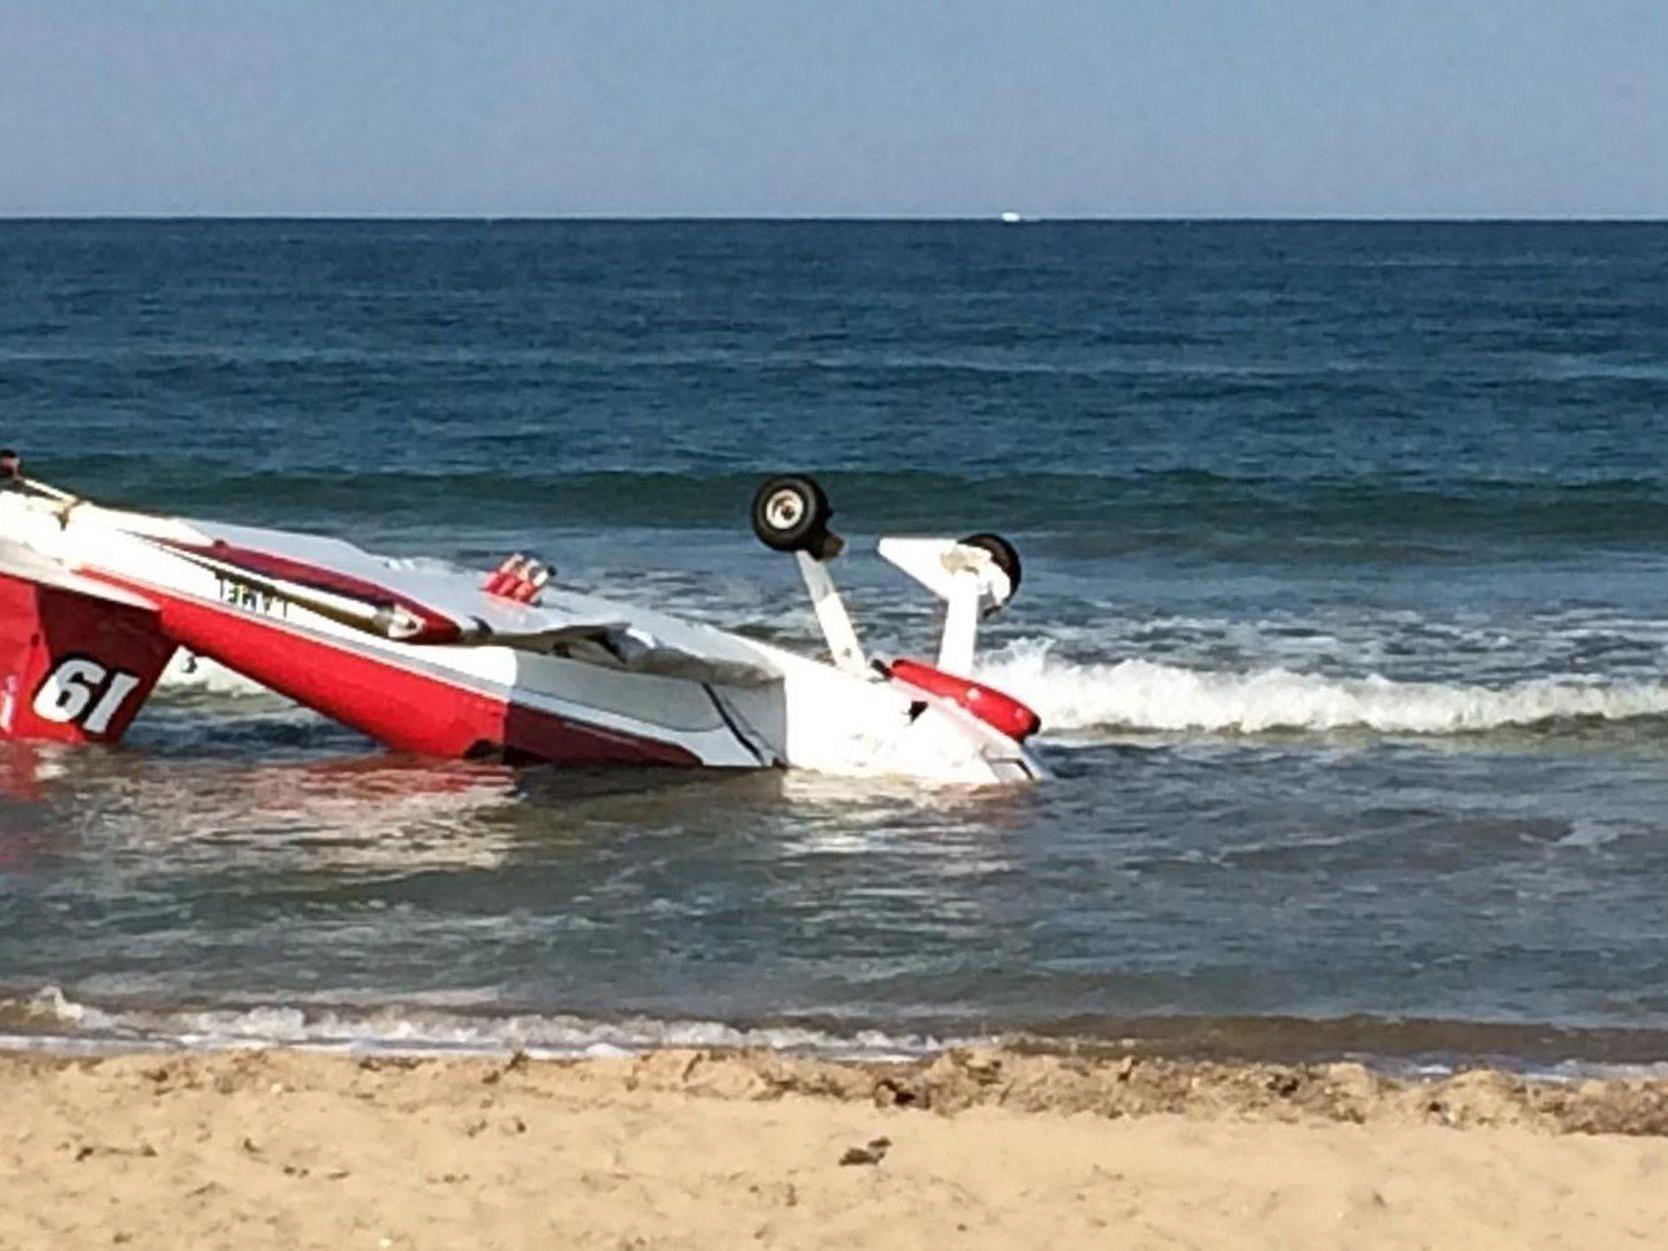 Toter bei Flugschau-Unfall in Italien.